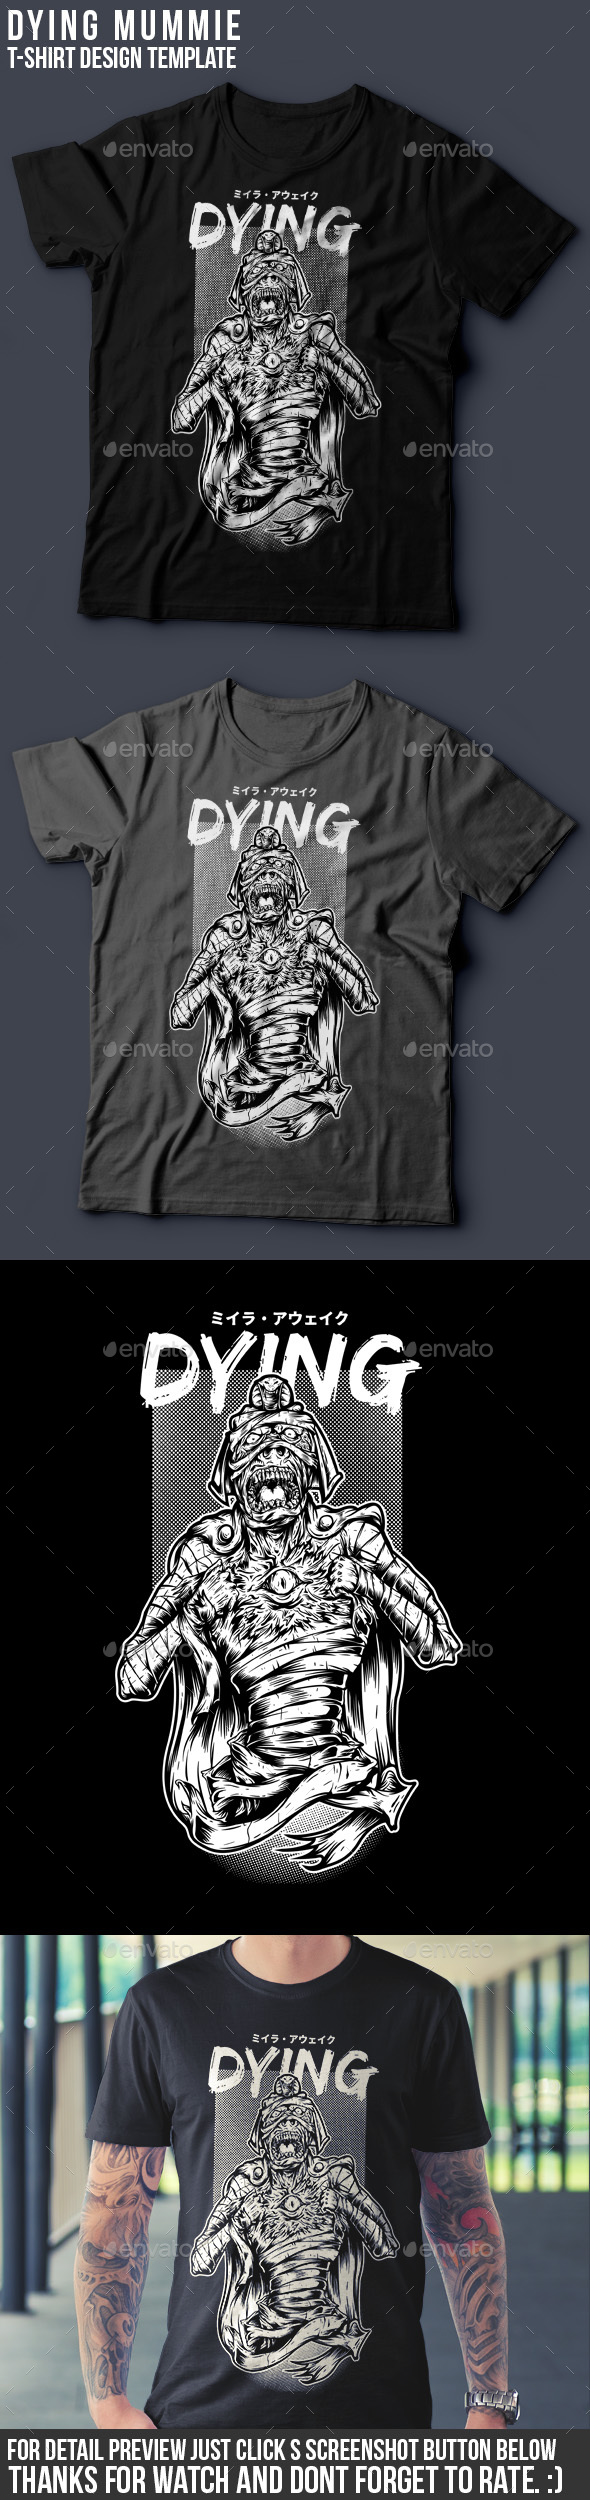 Dying Mummie T-Shirt Design - Grunge Designs